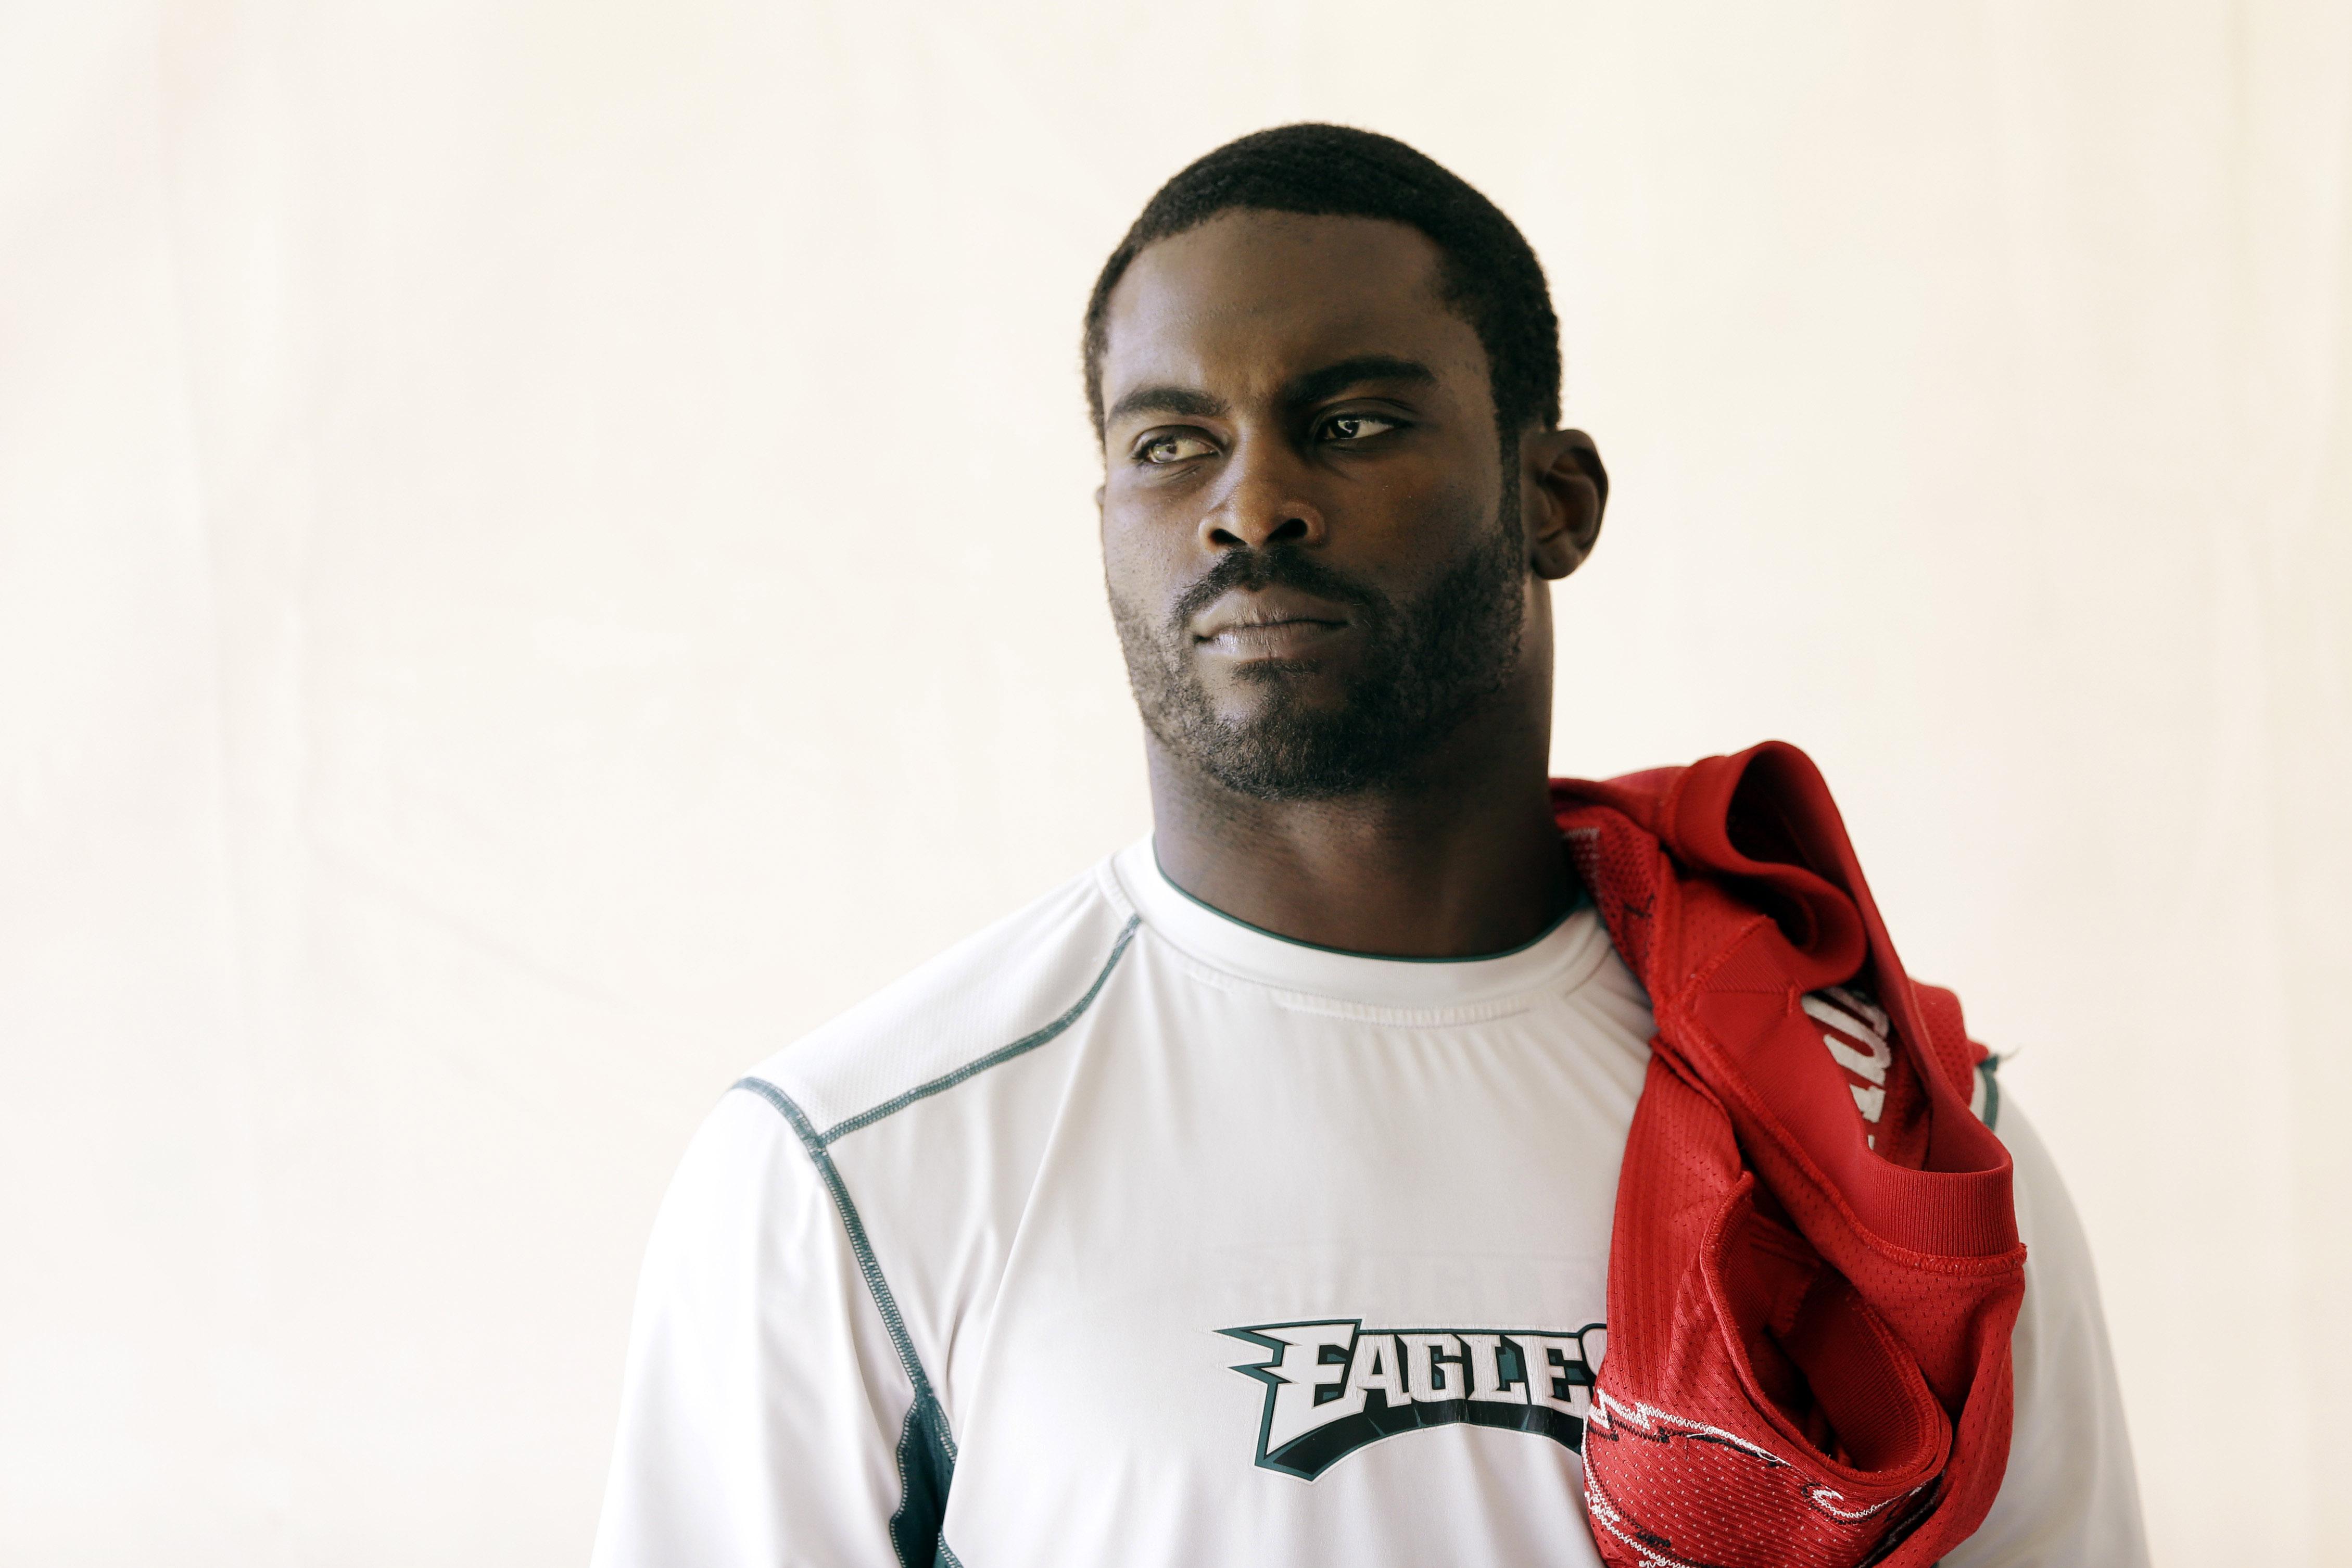 QB Vick a limited participant in Eagles practice